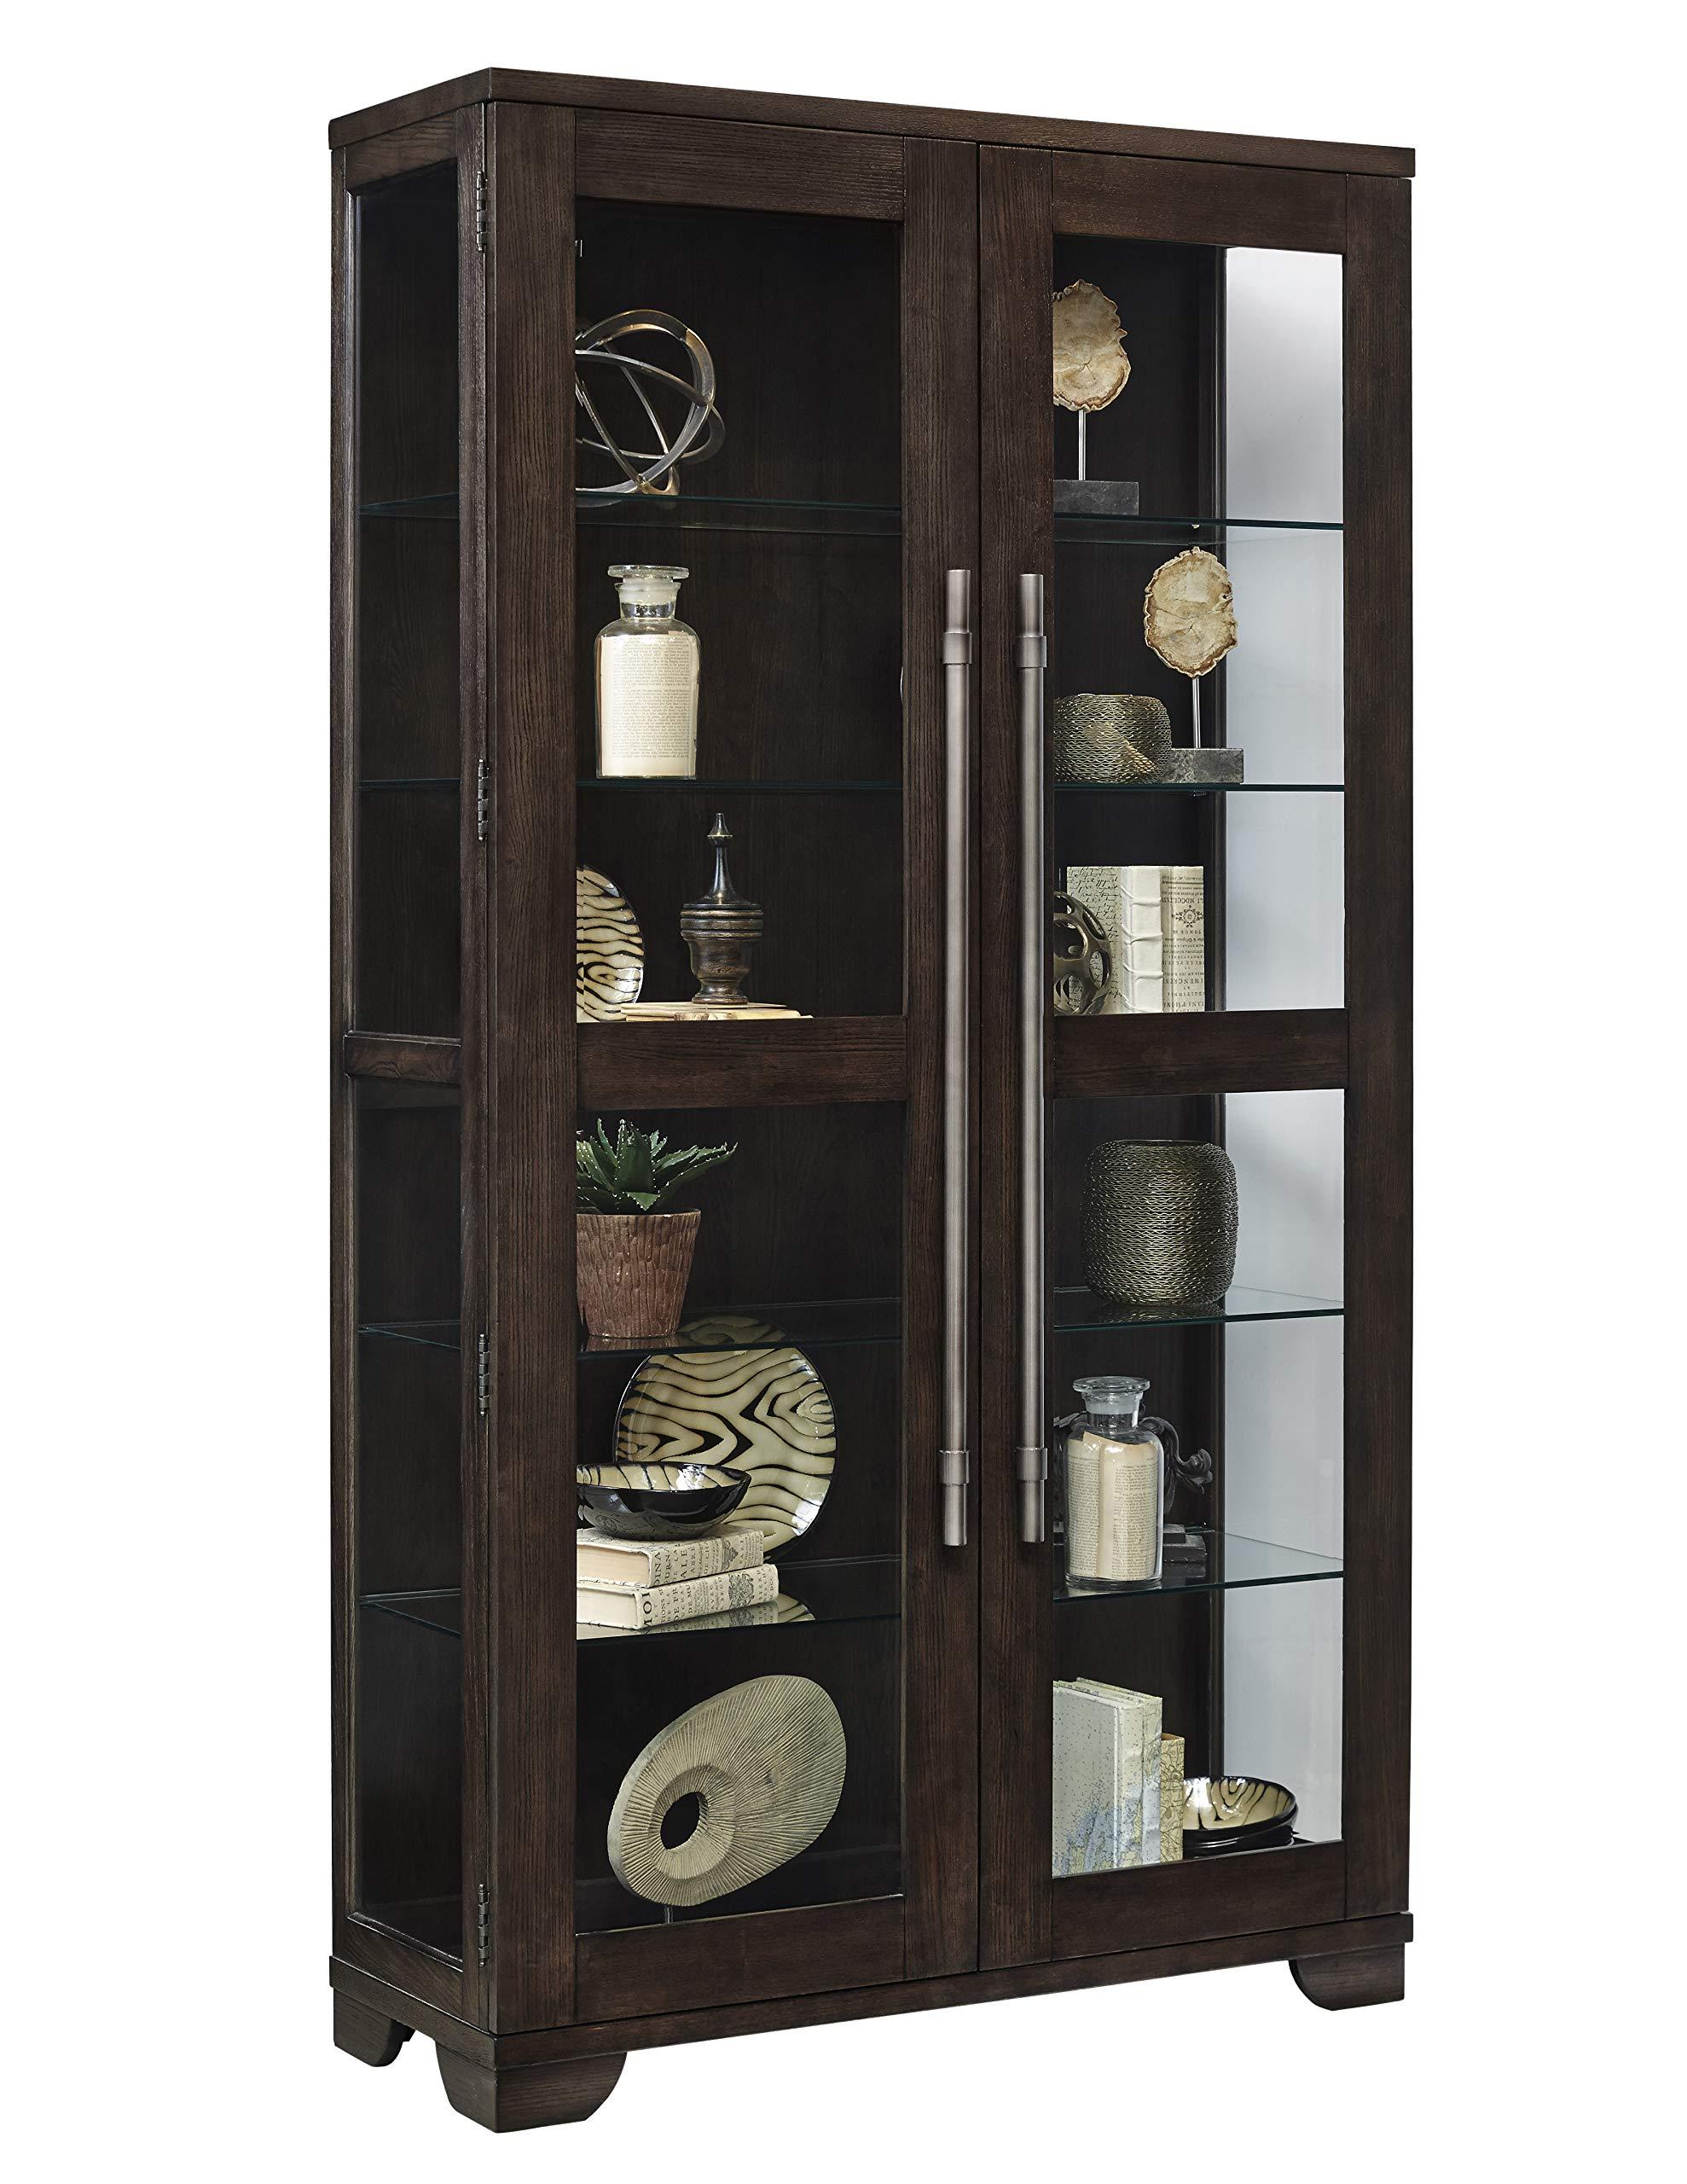 Pulaski P021585 Collection Zadie Two Door Curio Display Cabinet, 44'' x 16'' x 80'', Oak Brown